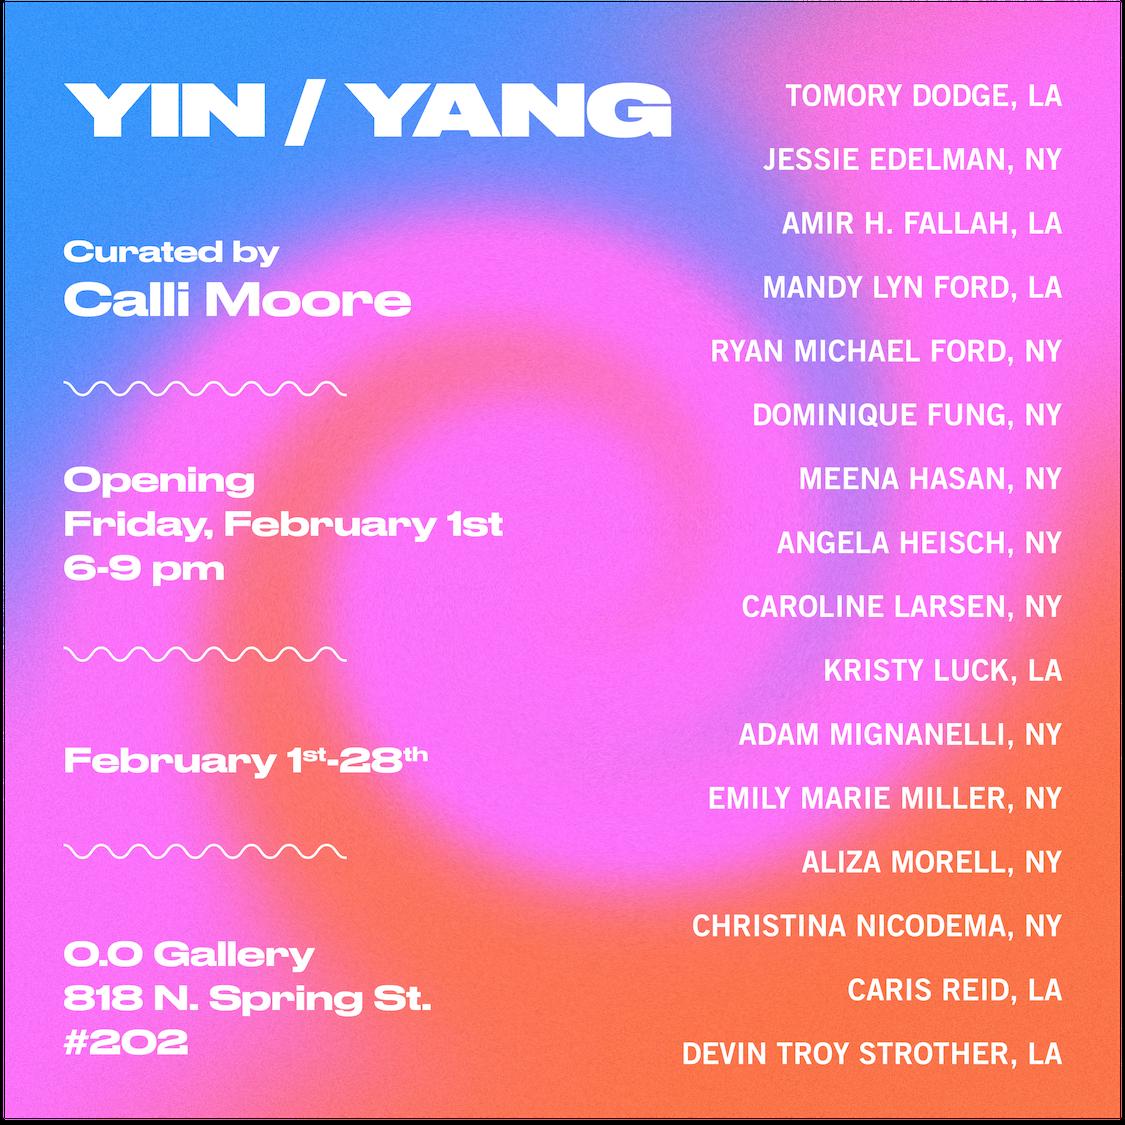 YIN YANG-02-01.jpg